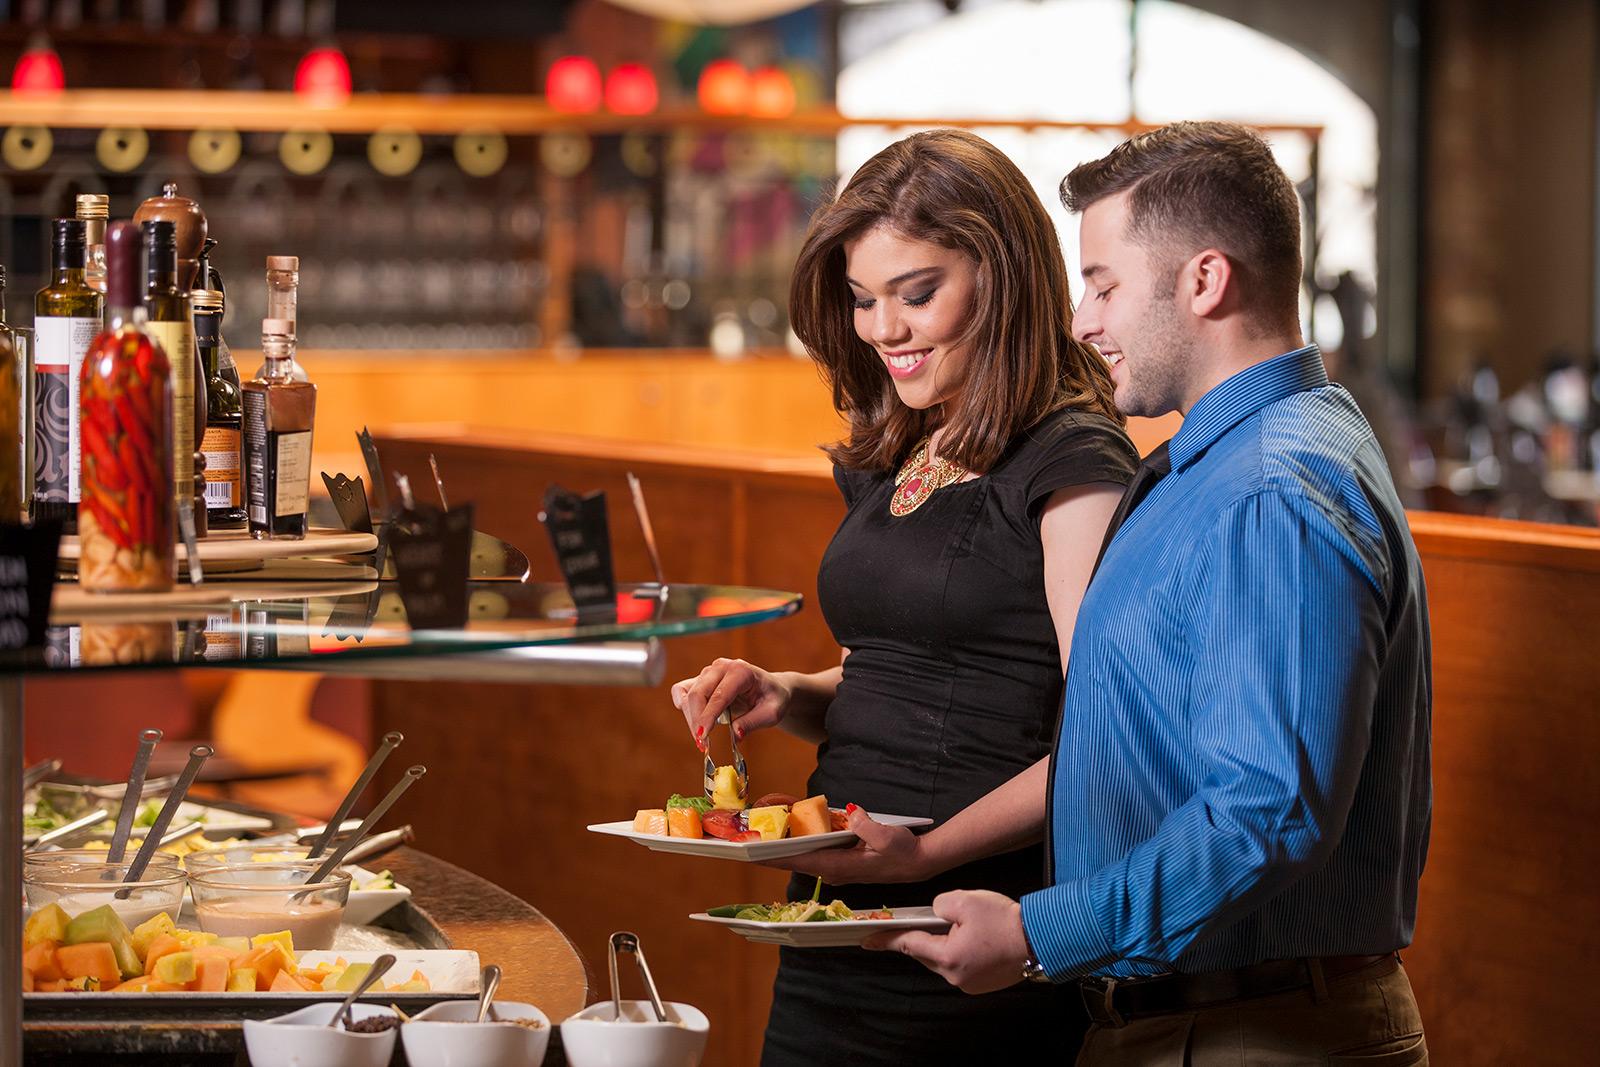 henderson nv specials restaurant deals brazilian steakhouse